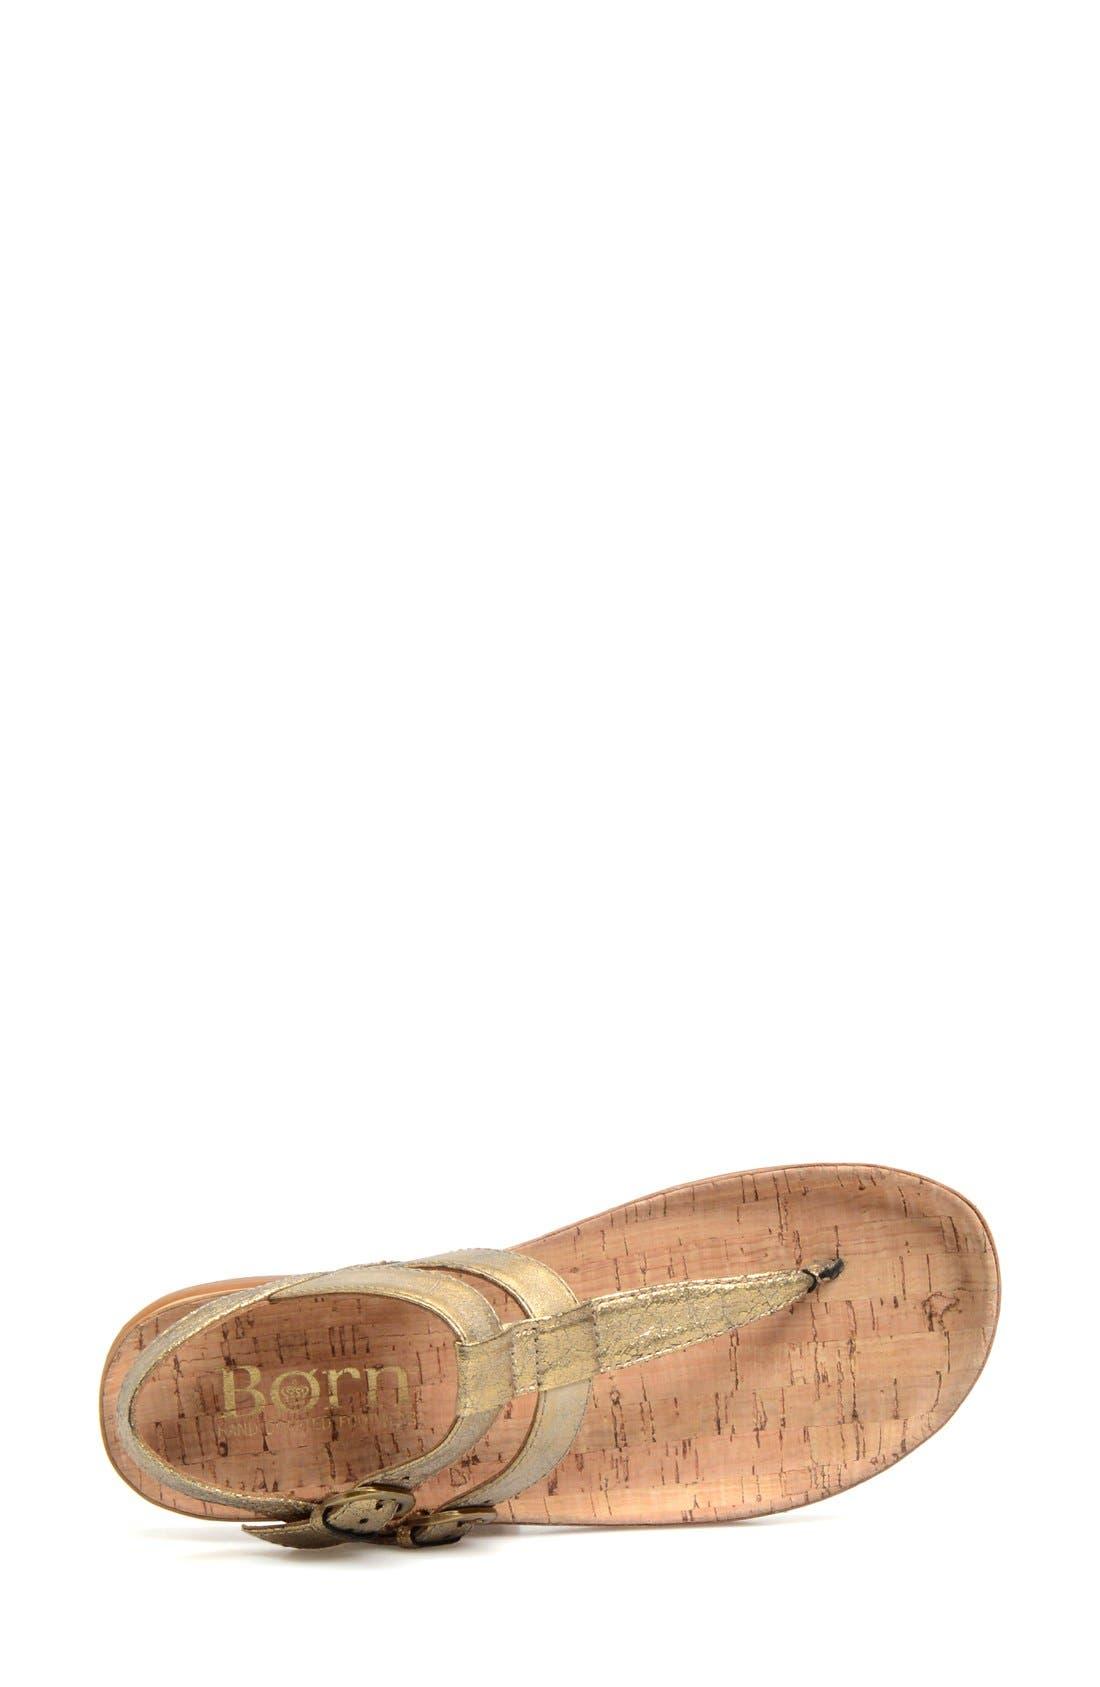 Alternate Image 3  - Børn 'Reta' Leather Thong Sandal (Women)